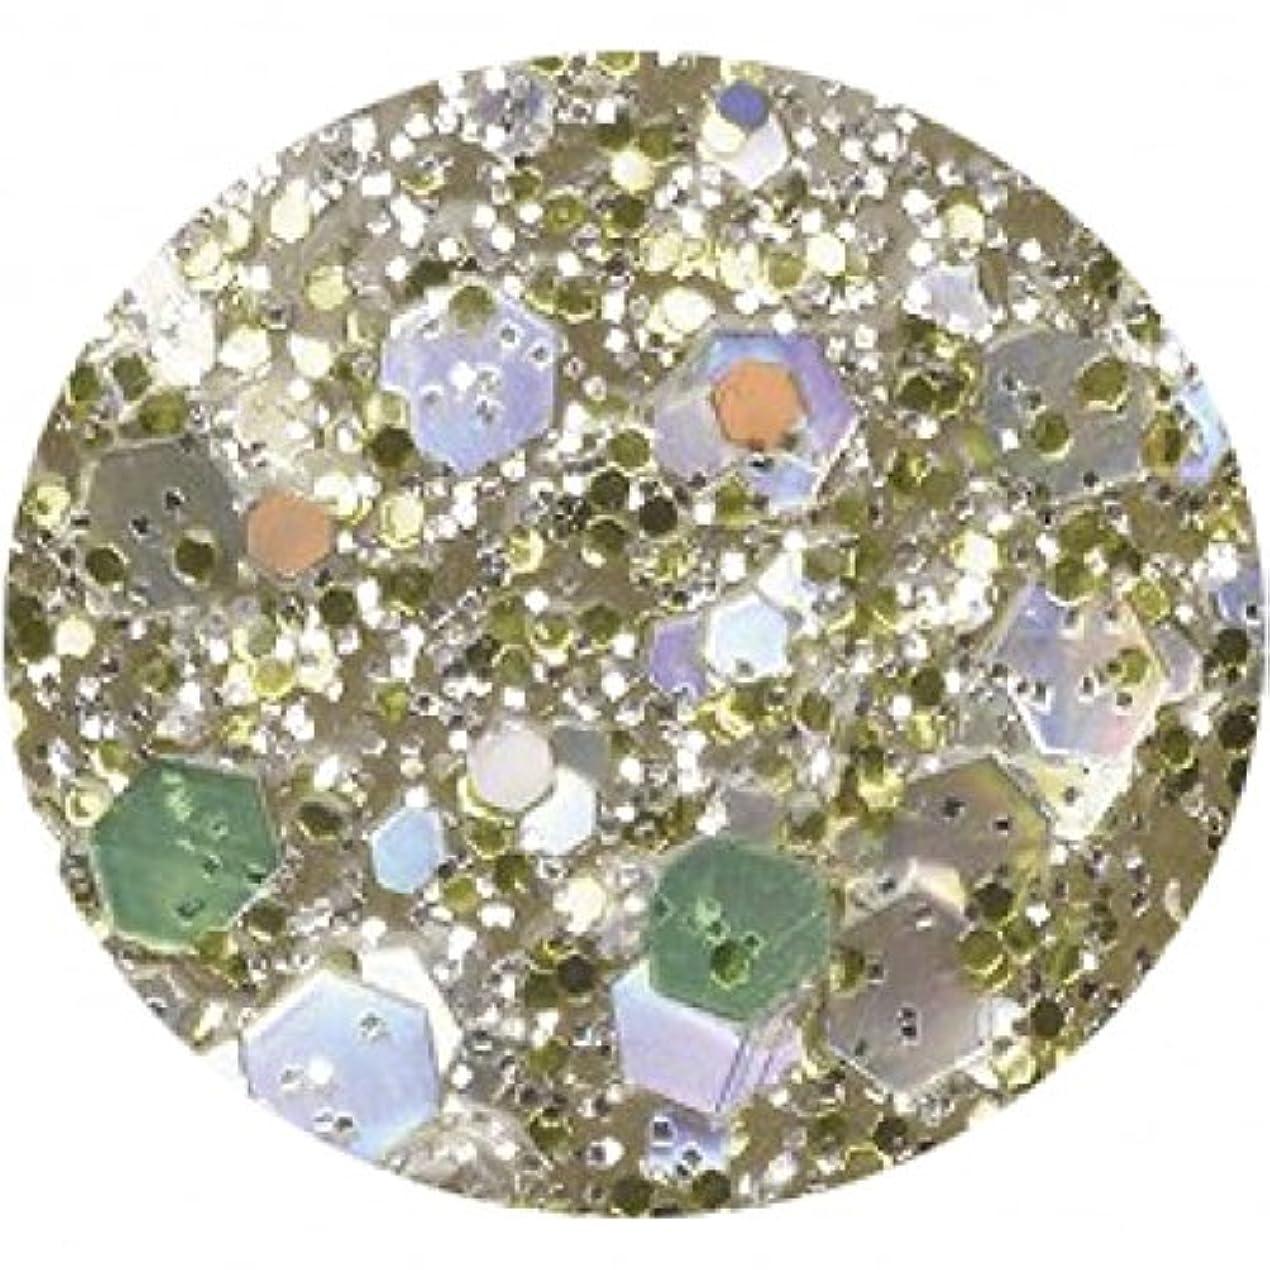 出力保有者蒸Entity One Color Couture Gel Polish - Chrysanthemum Gold Coins - 0.5oz / 15ml